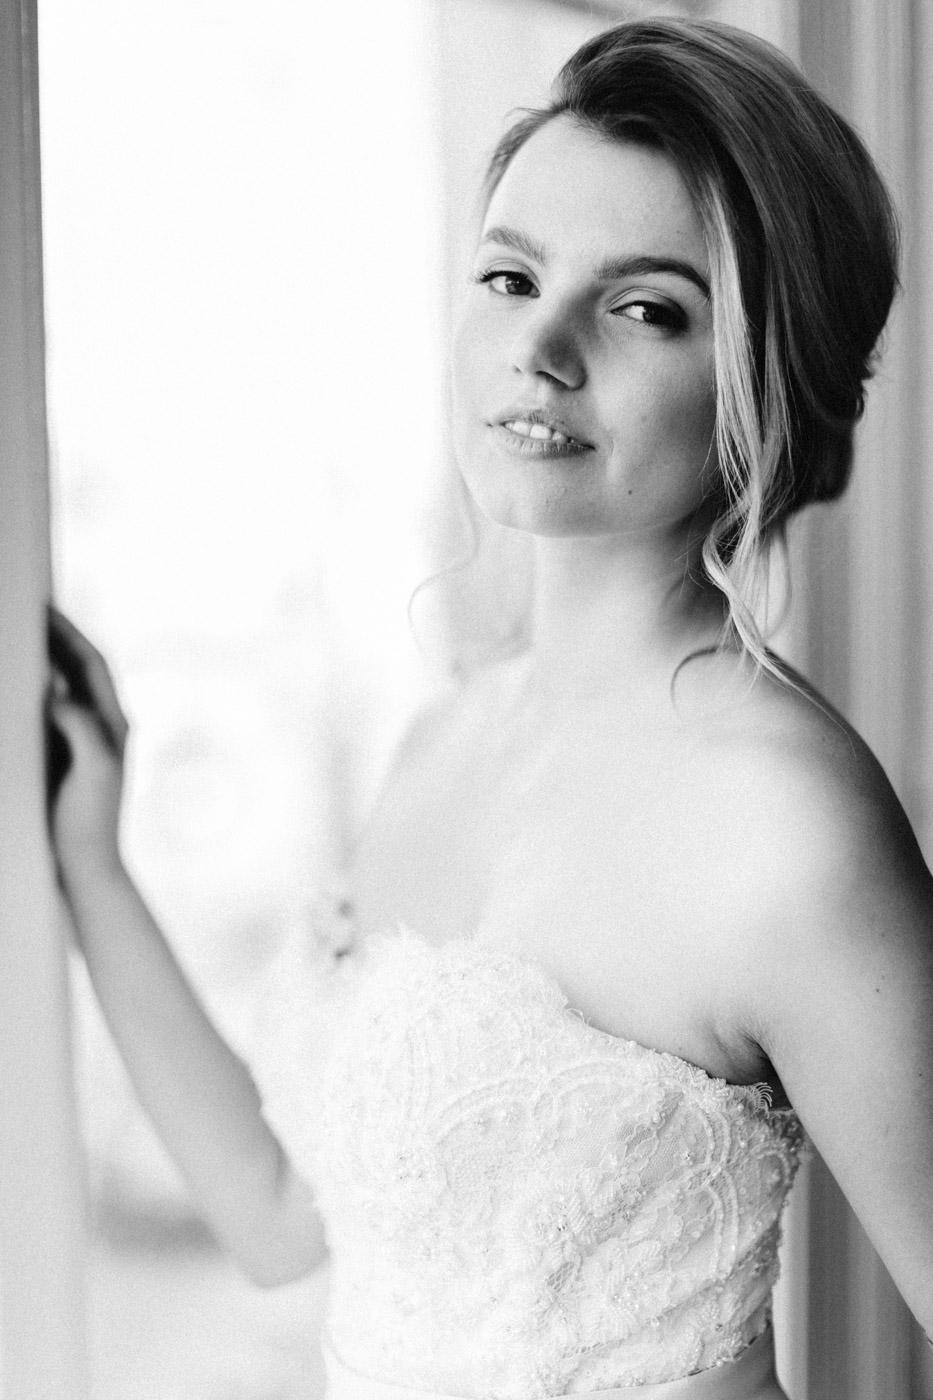 the_great_hall_wedding_photos 2017-170.jpg